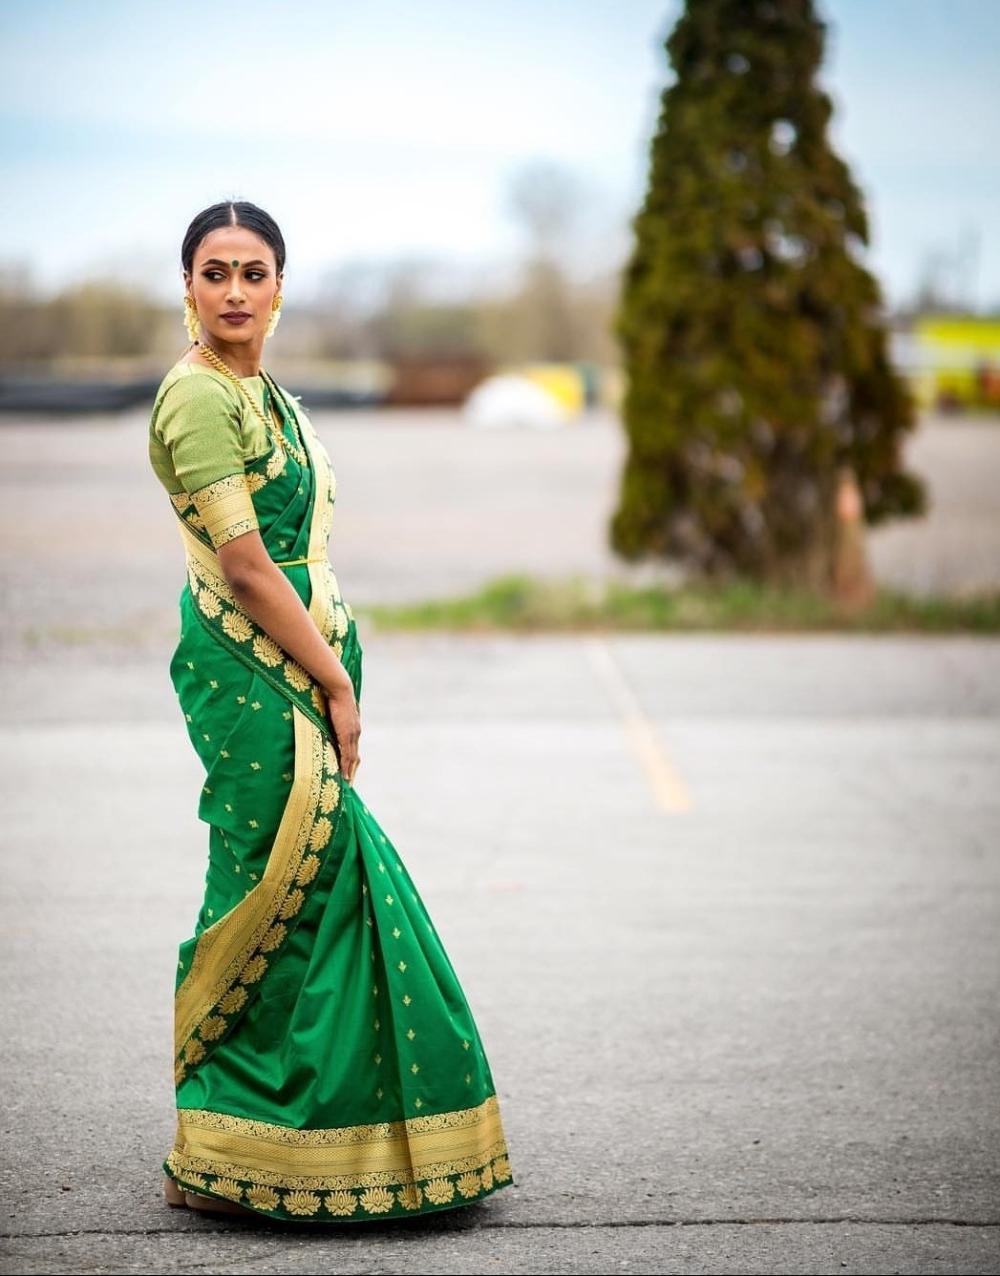 Thanuska Subramaniam